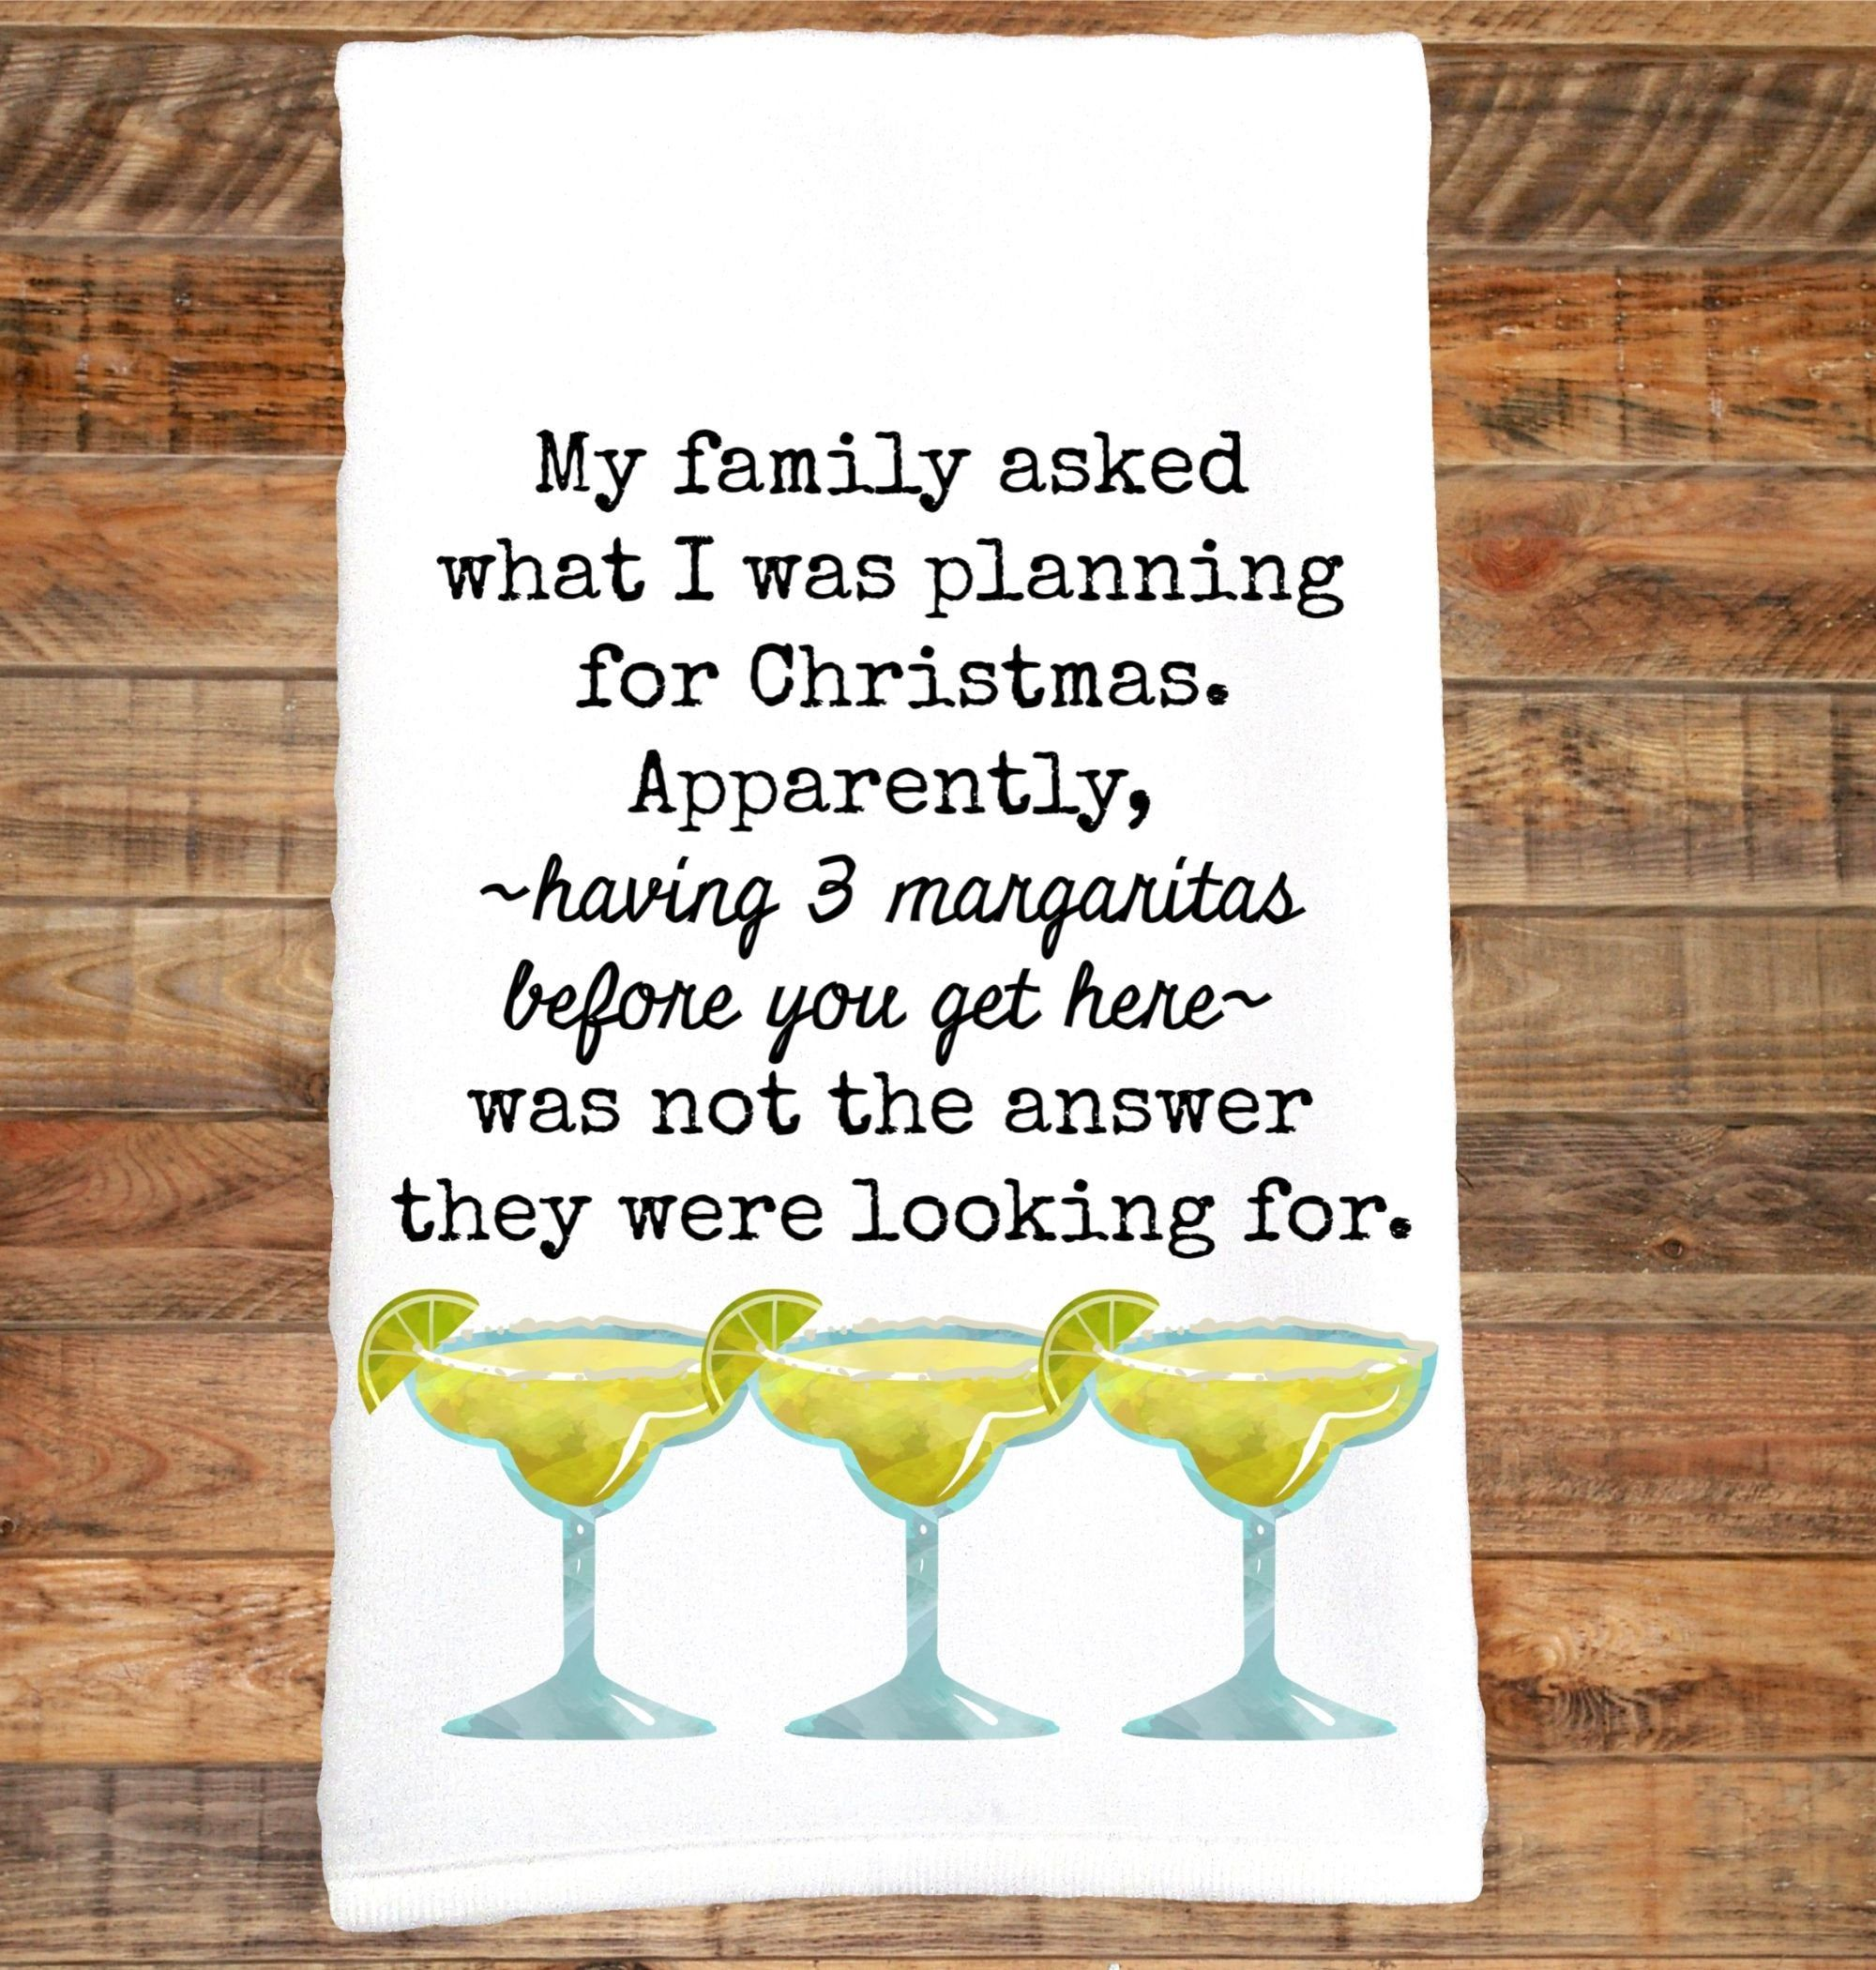 Christmas Margarita Towel, Funny Towel, Margaritas, Margarita, Cocktails, Snarky Towel, Christmas Hostess Gift, Dish Towel, Tequila Drinker #christmasmargarita